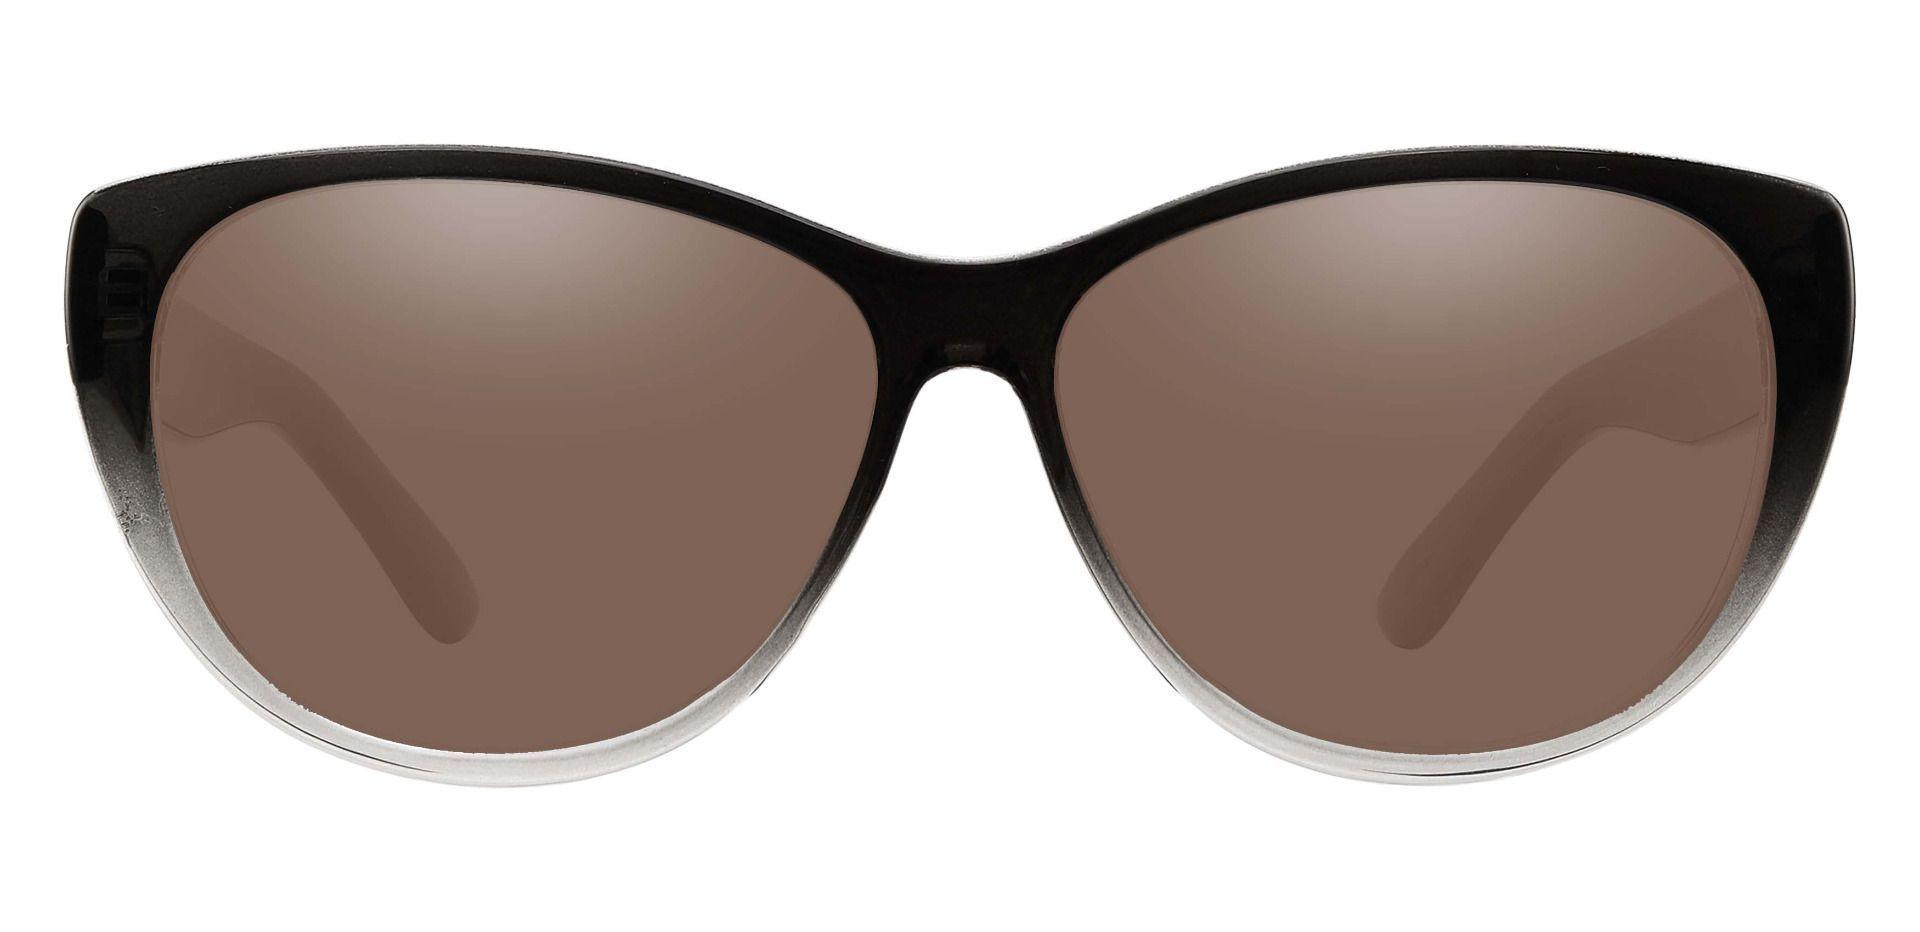 Lynn Cat-Eye Prescription Sunglasses - Gray Frame With Brown Lenses